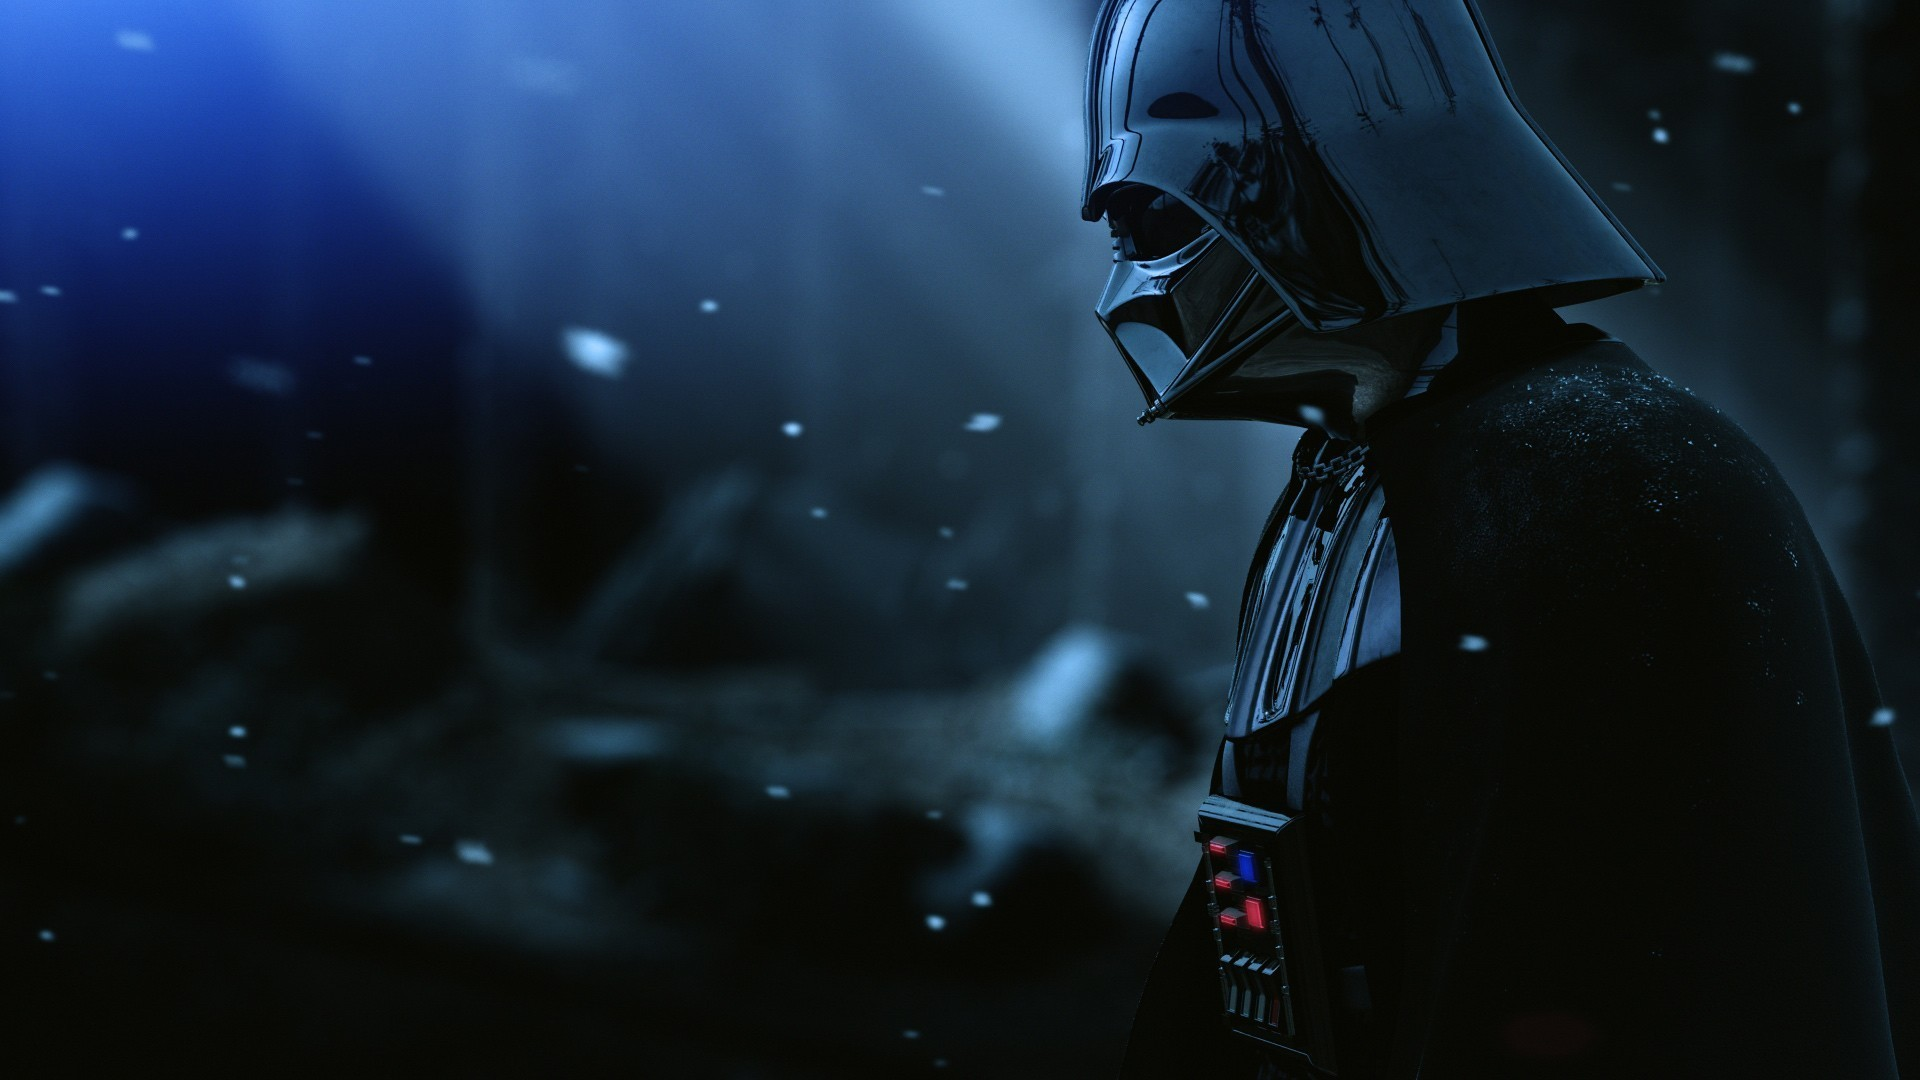 General anime Darth Vader villain anime Jedi evil armor movies  Star Wars blurred digital art